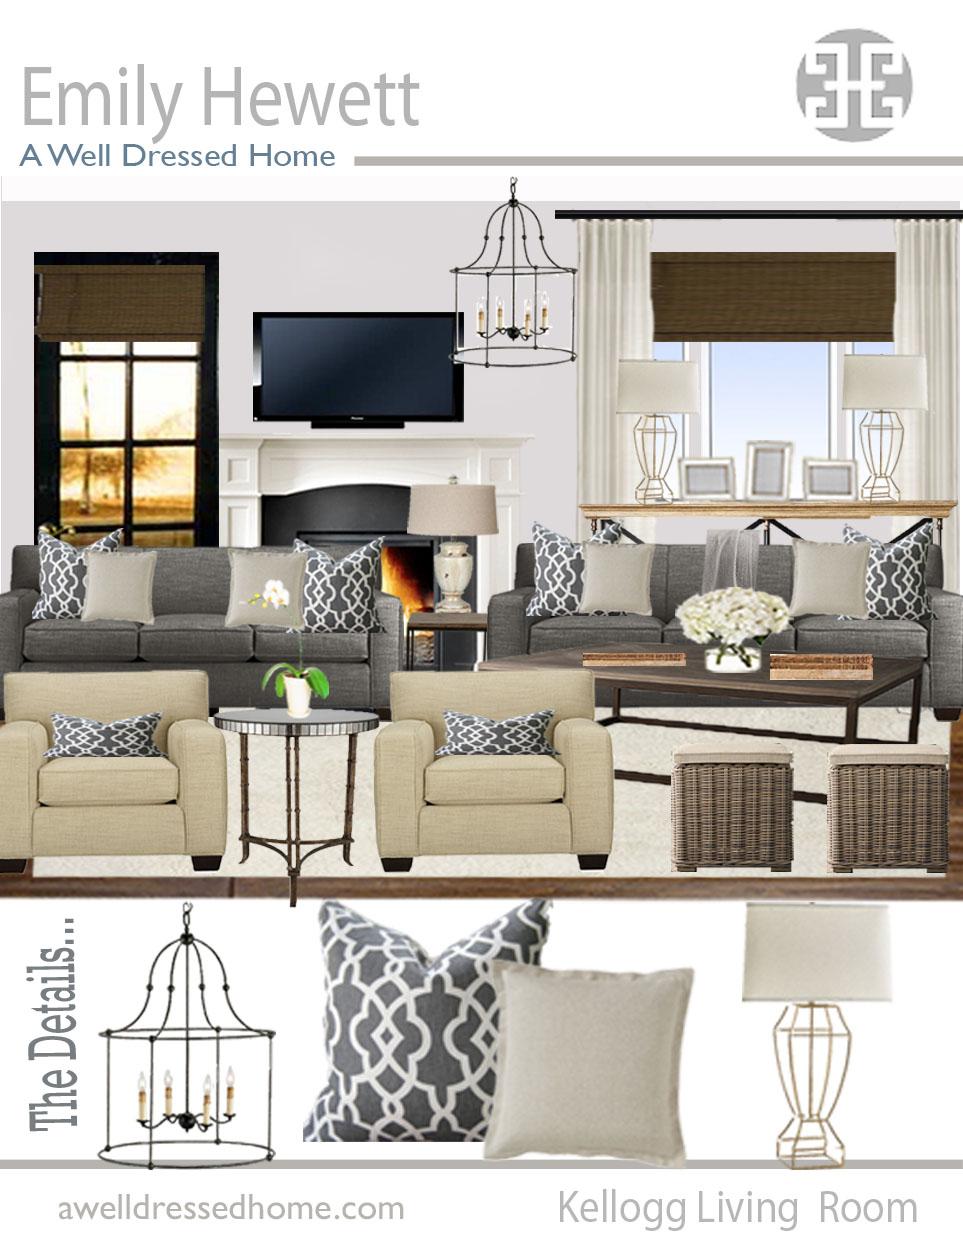 AWDH ODB Kellogg Living Room Online Design Board by AWDH